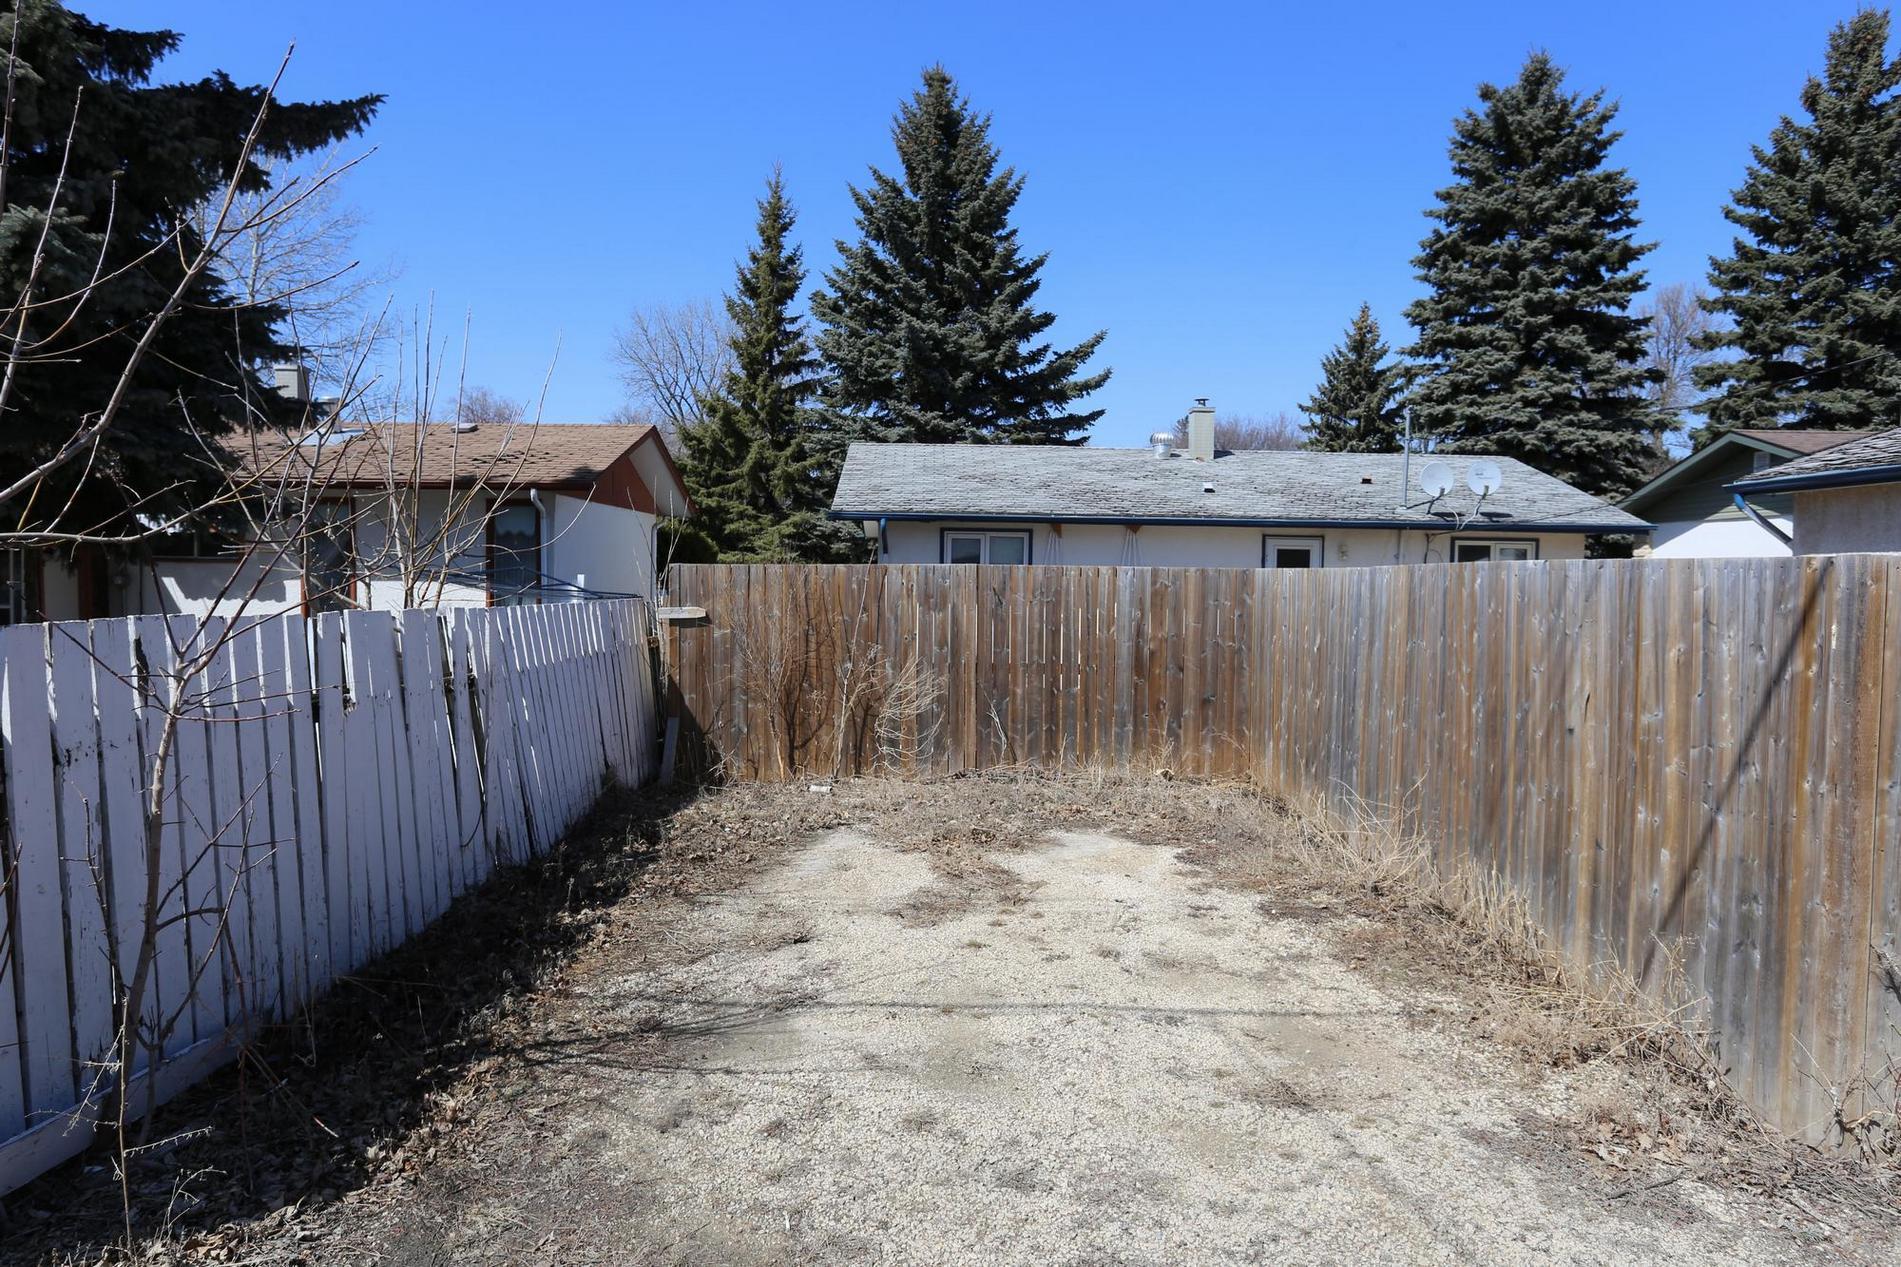 74 Robertson Crescent, Winnipeg, Manitoba  R2M 2N3 - Photo 25 - 1809350